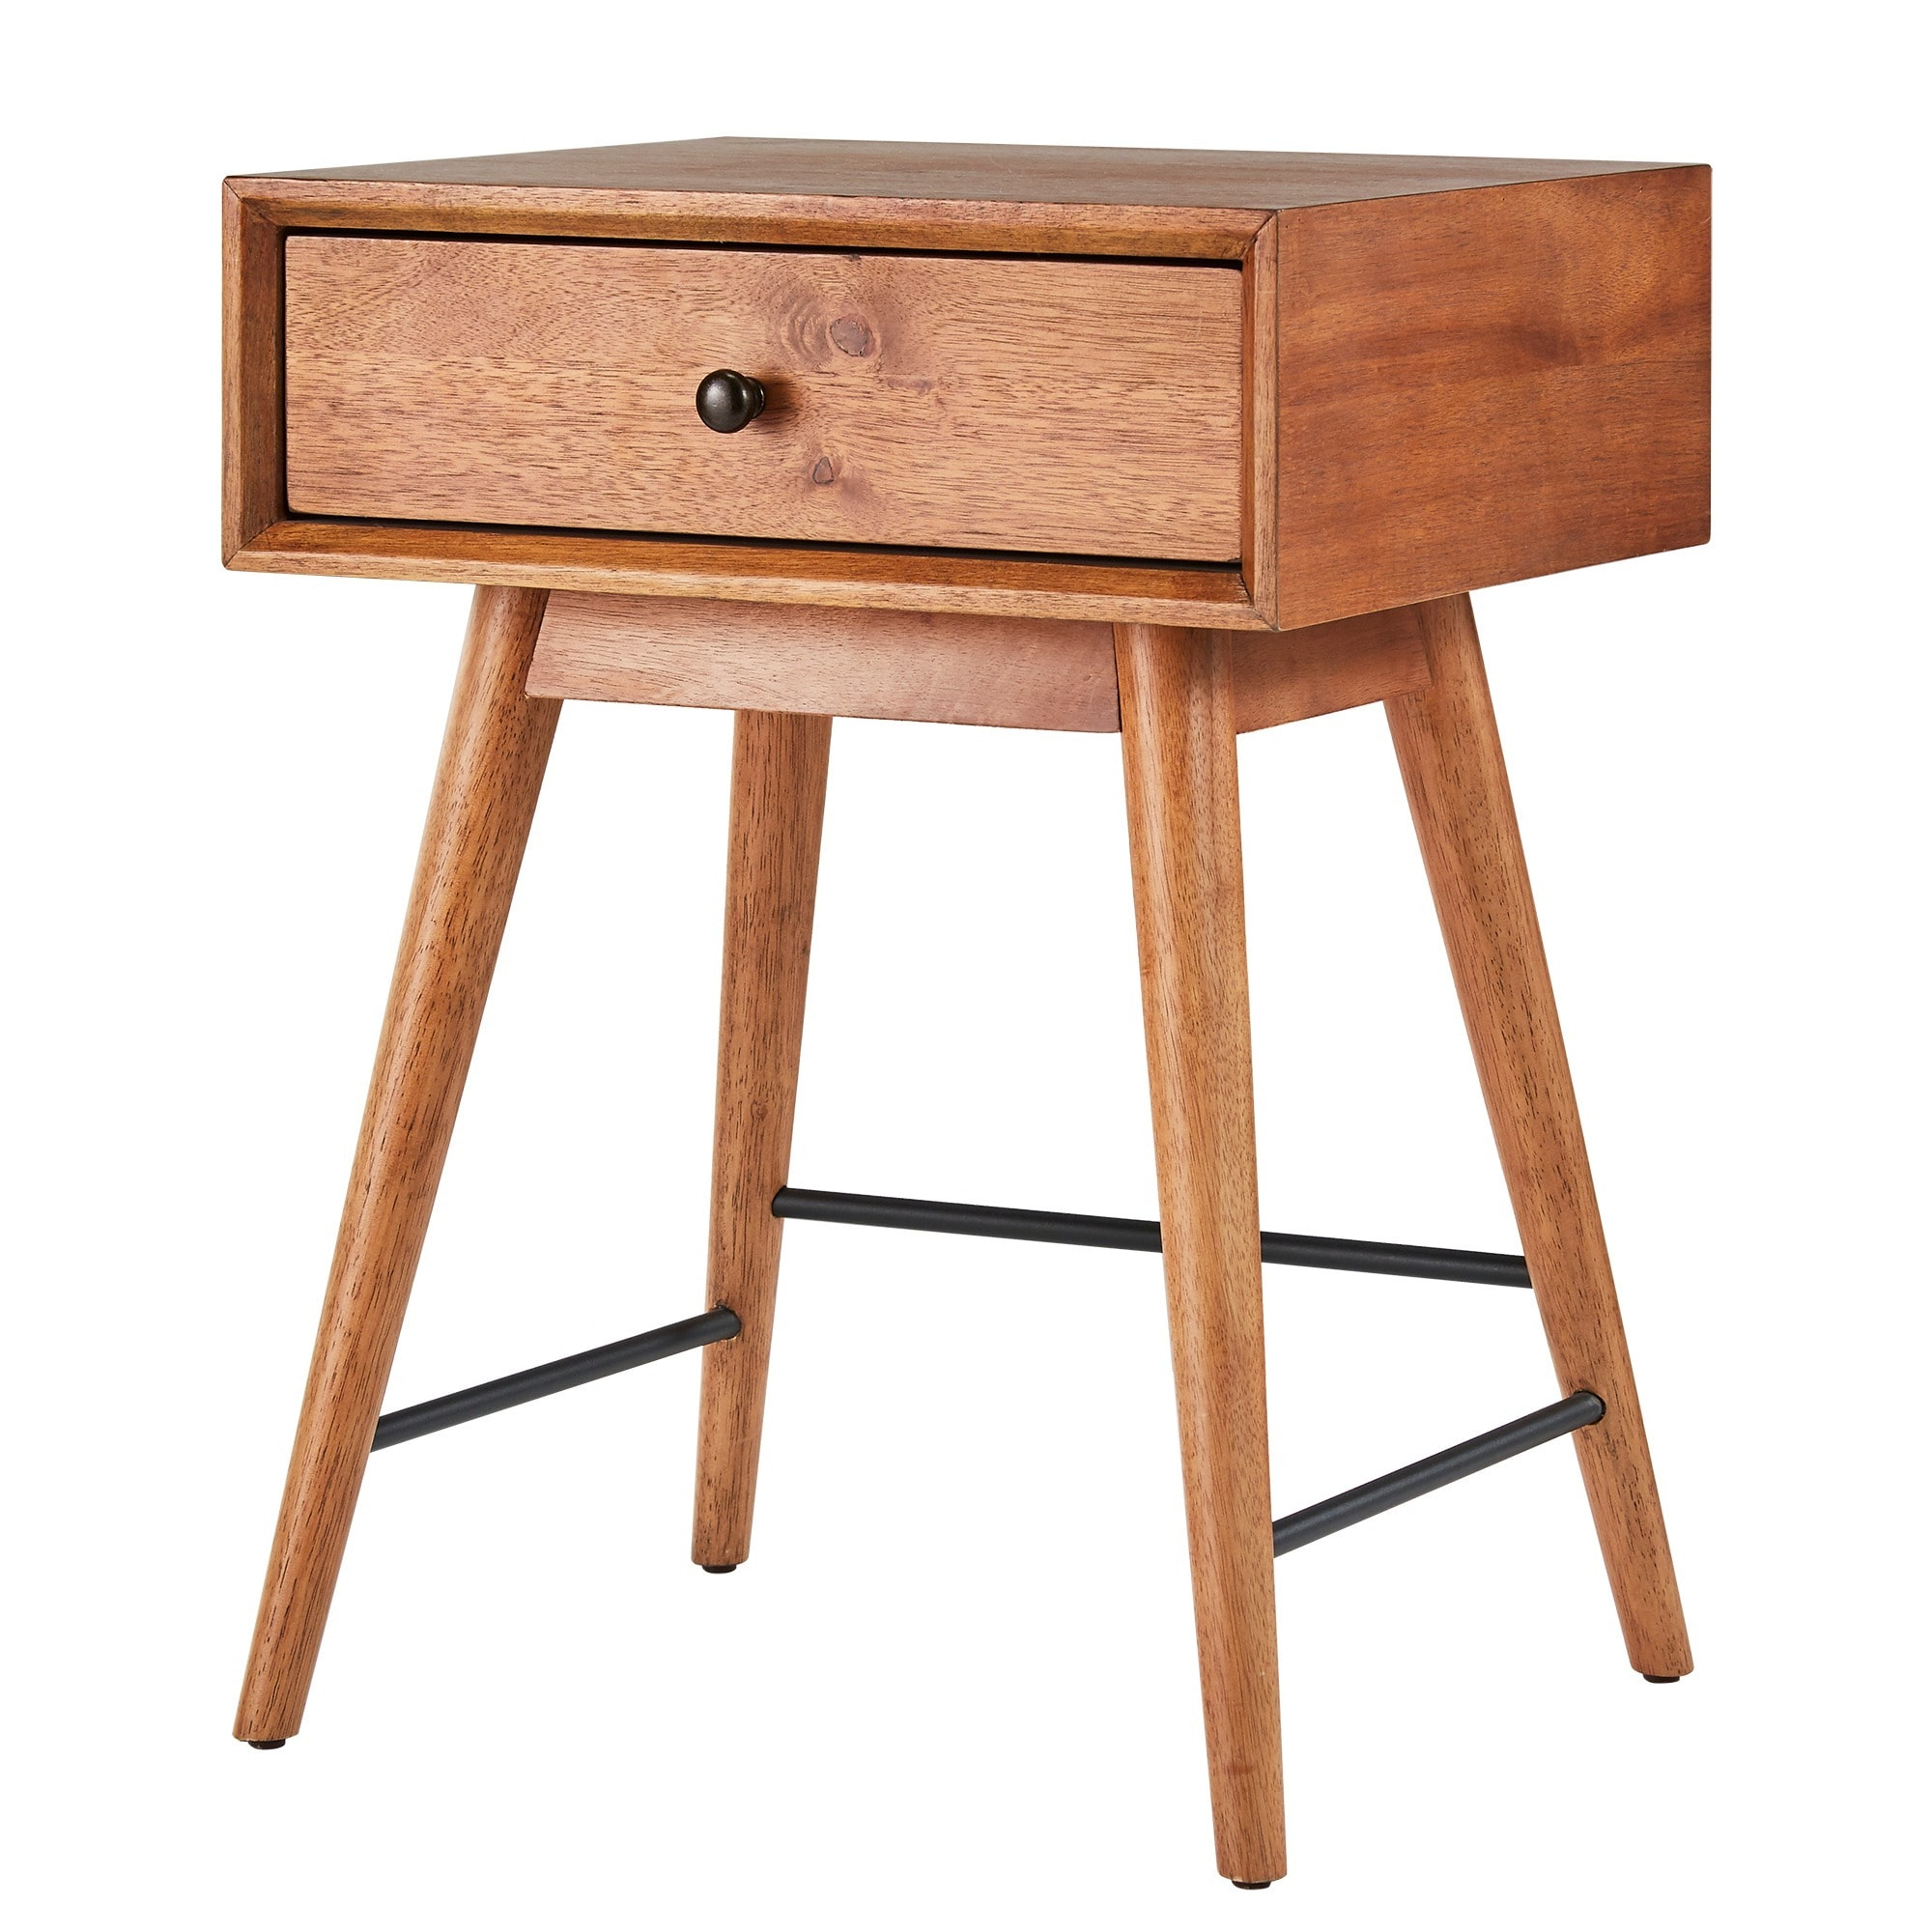 wayfair co reviews table pdp drawer fj uk furniture rde drawers fjorde newman bedside